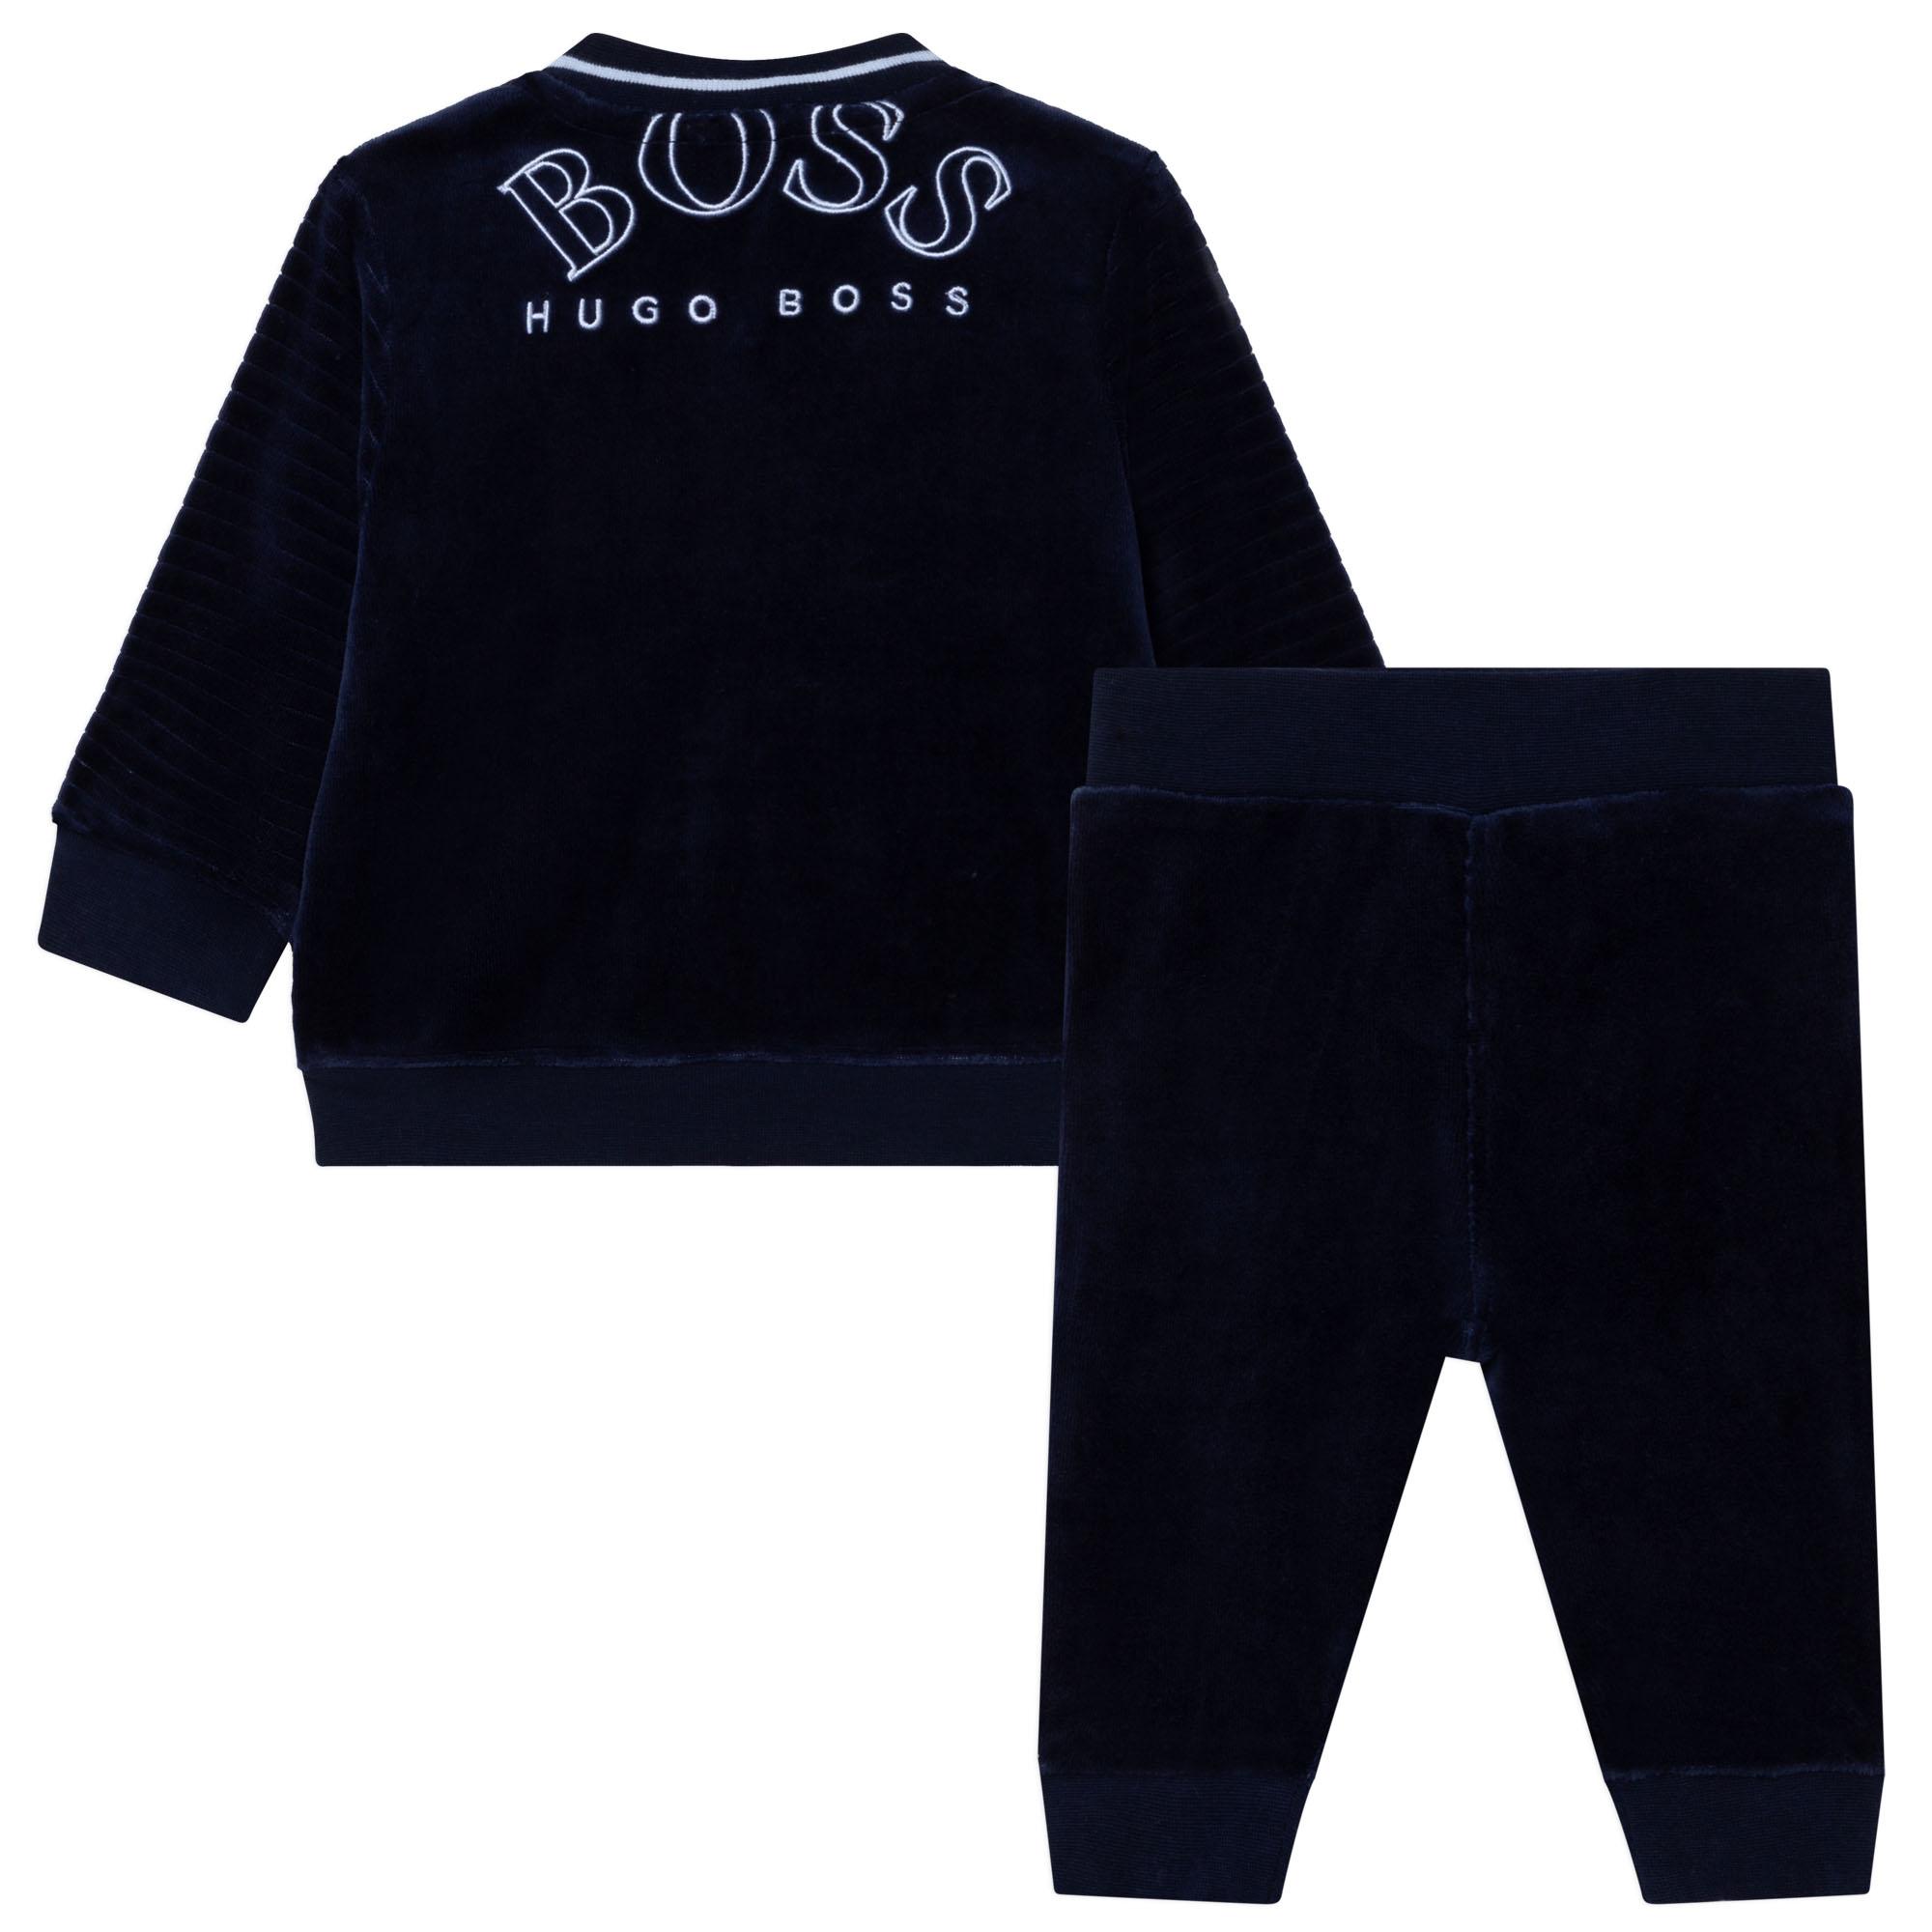 Fleece jogging set BOSS for BOY